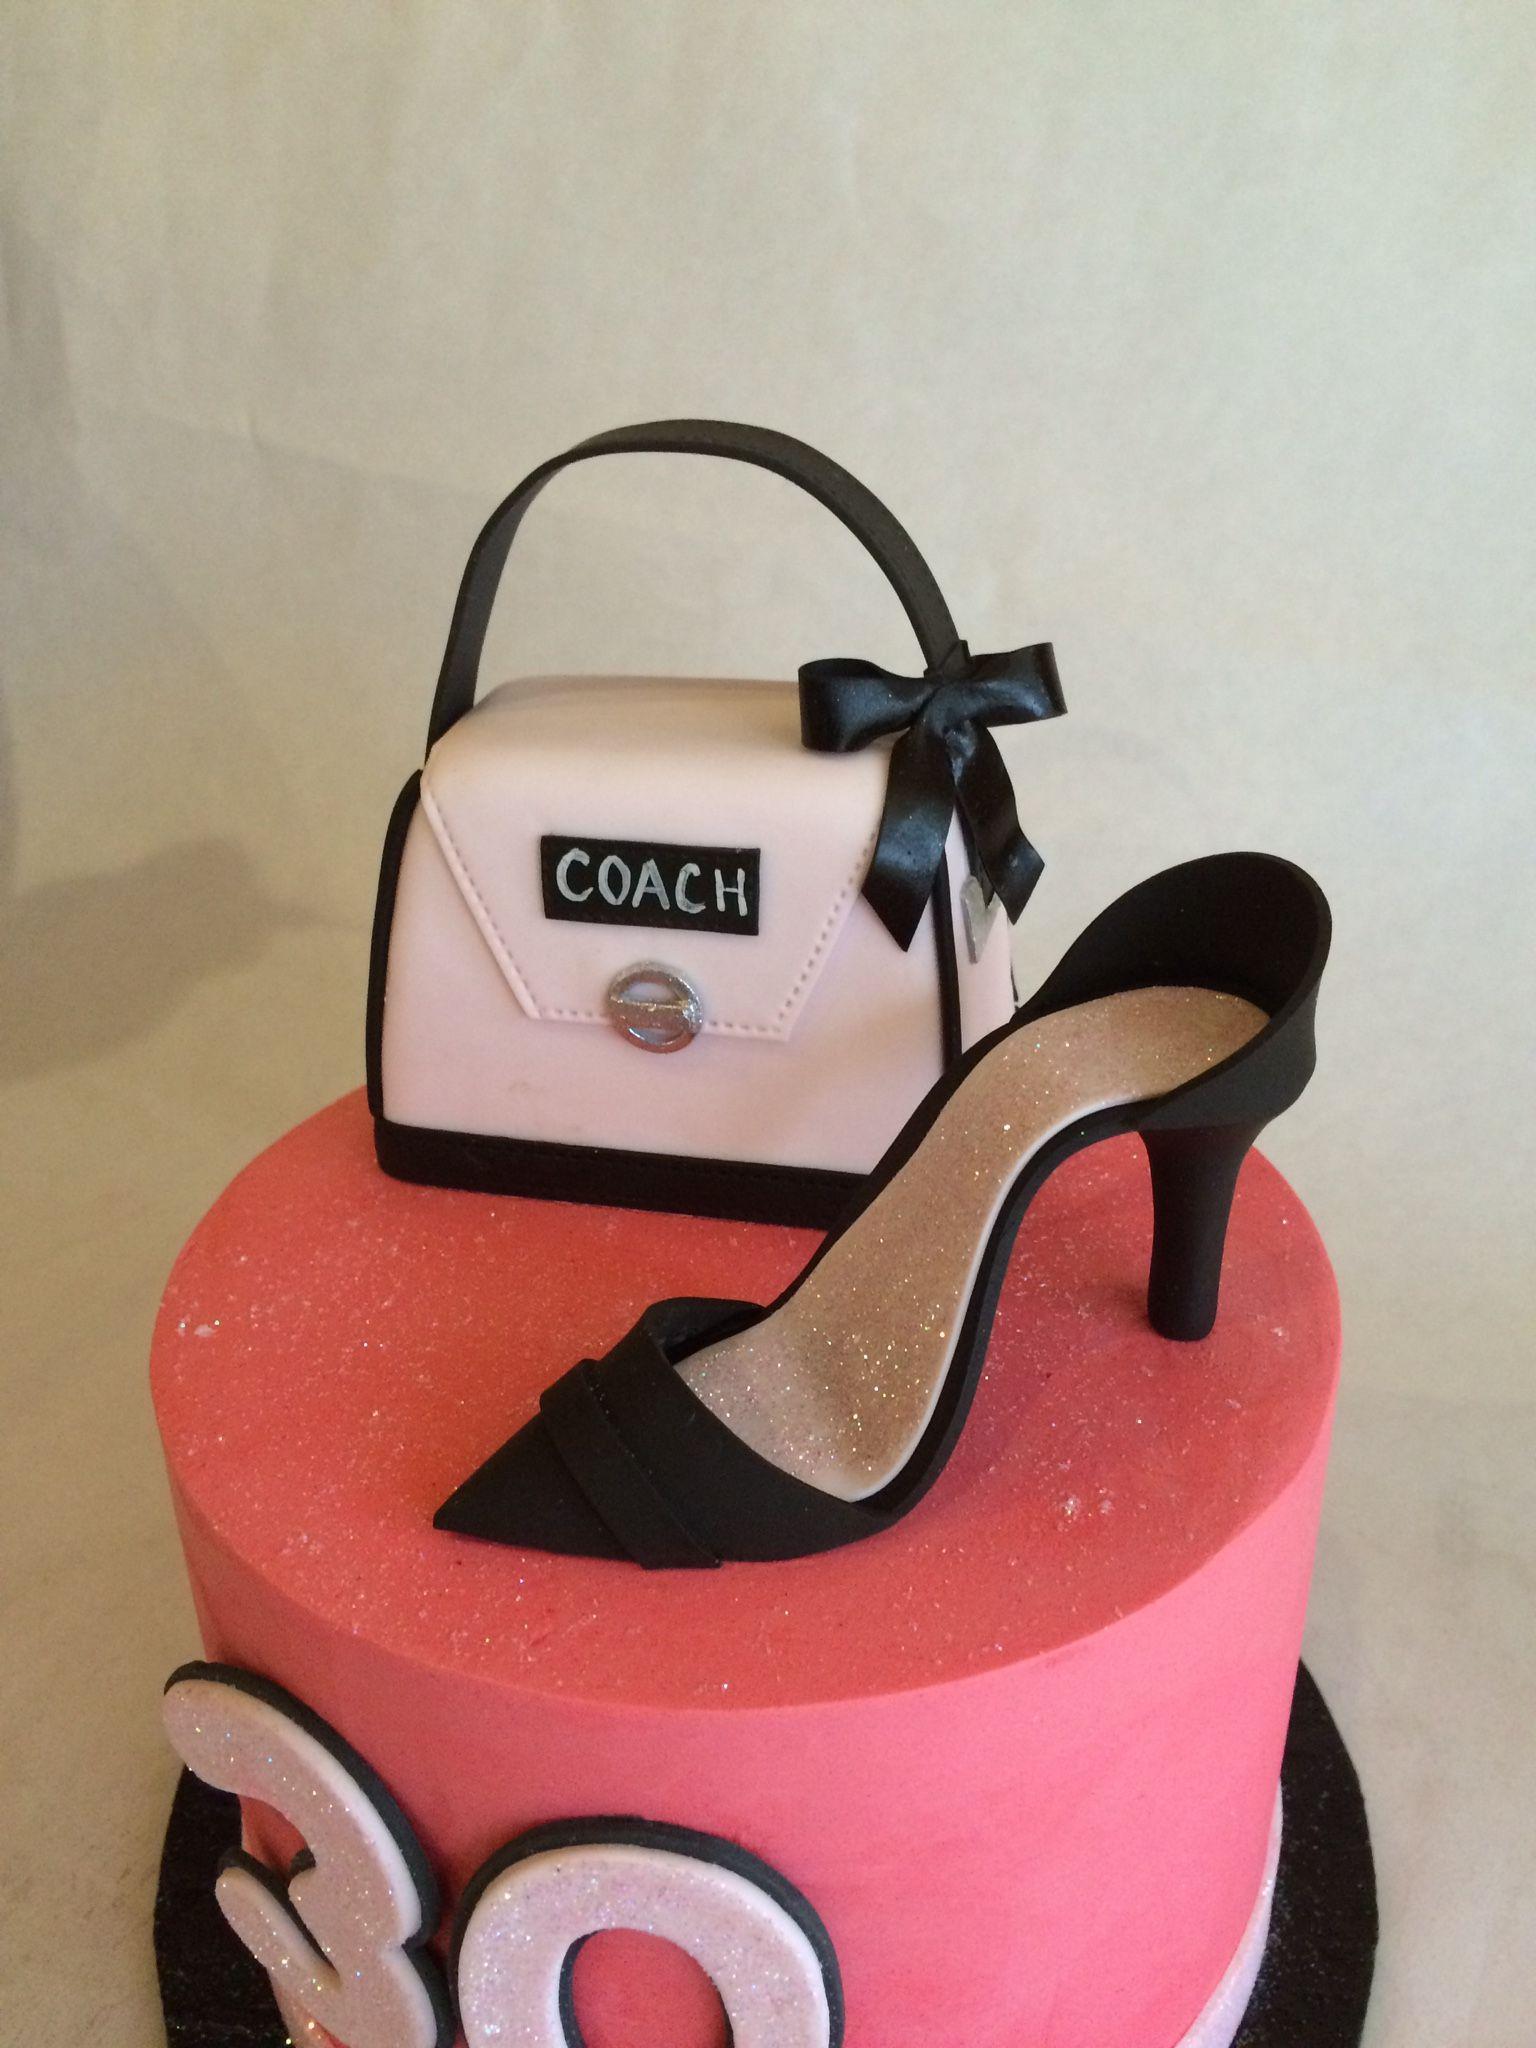 Coach Purse cake fondant high heel birthday cake ...